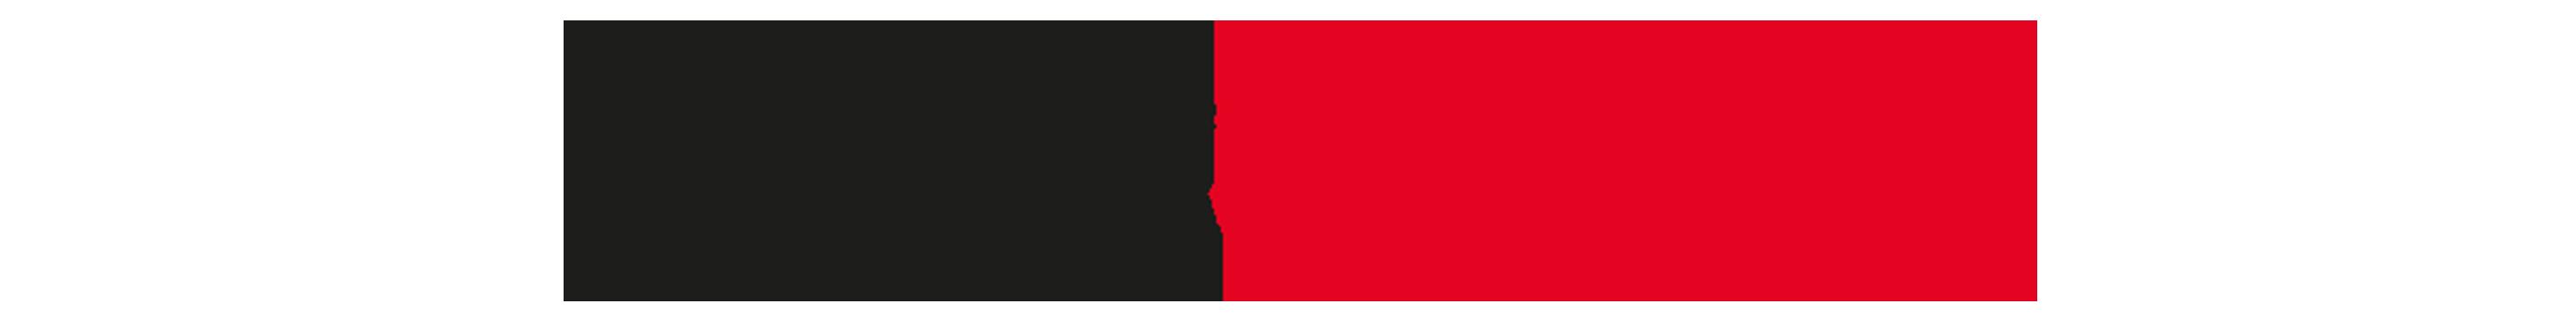 https://yulcom-technologies.com/wp-content/uploads/2021/06/Jeune-Afrique-logo-1-1.png